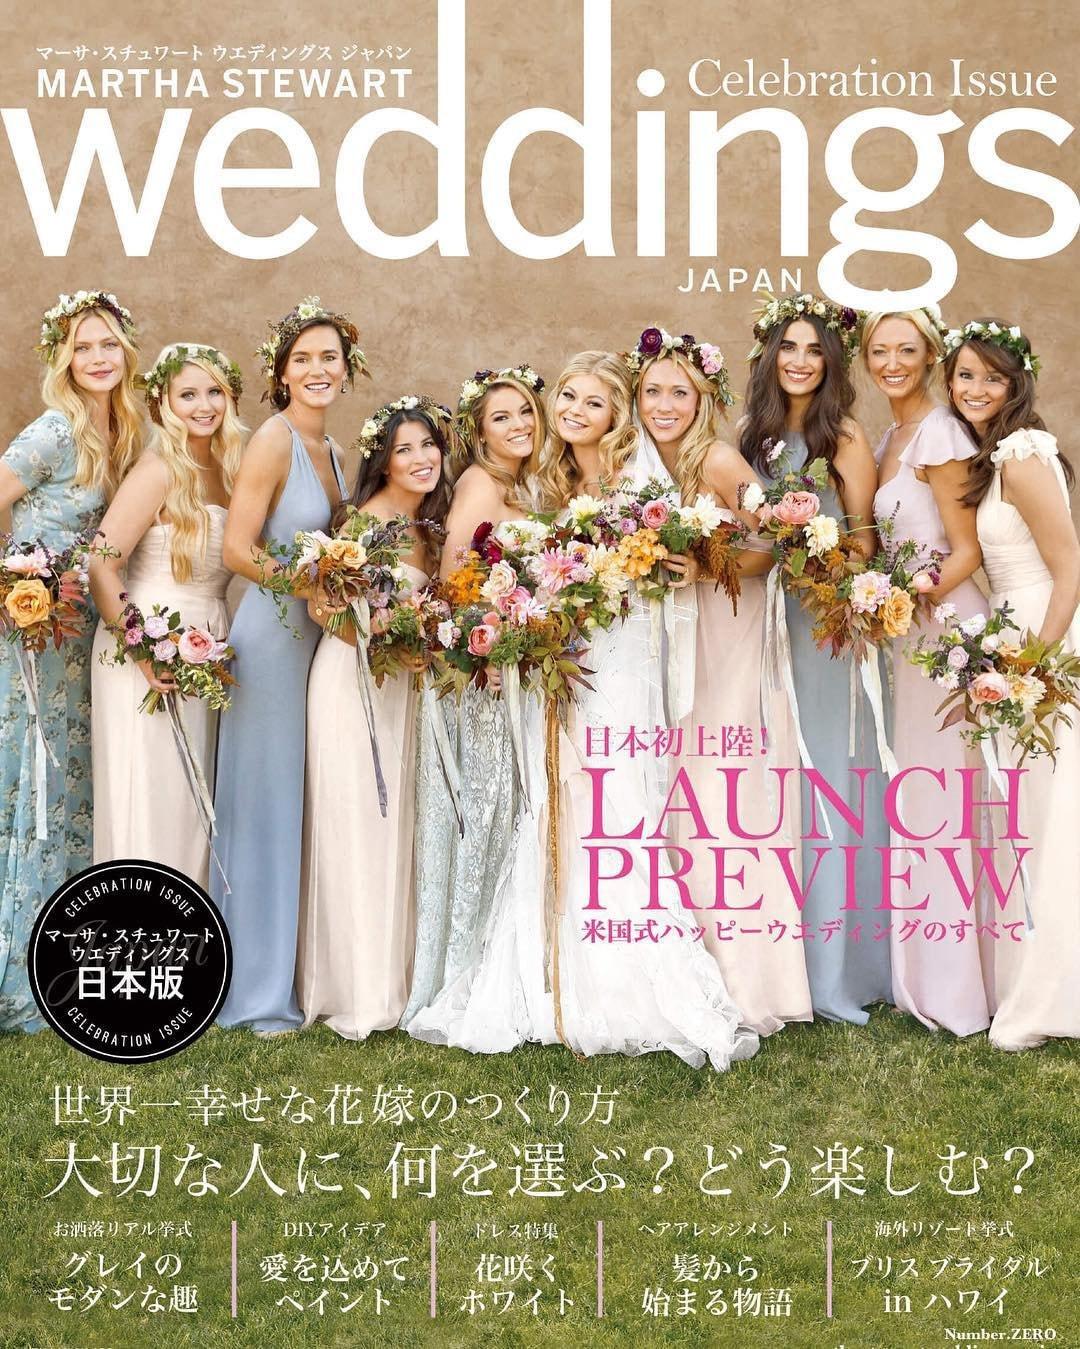 Martha Stuart Weddings Japan